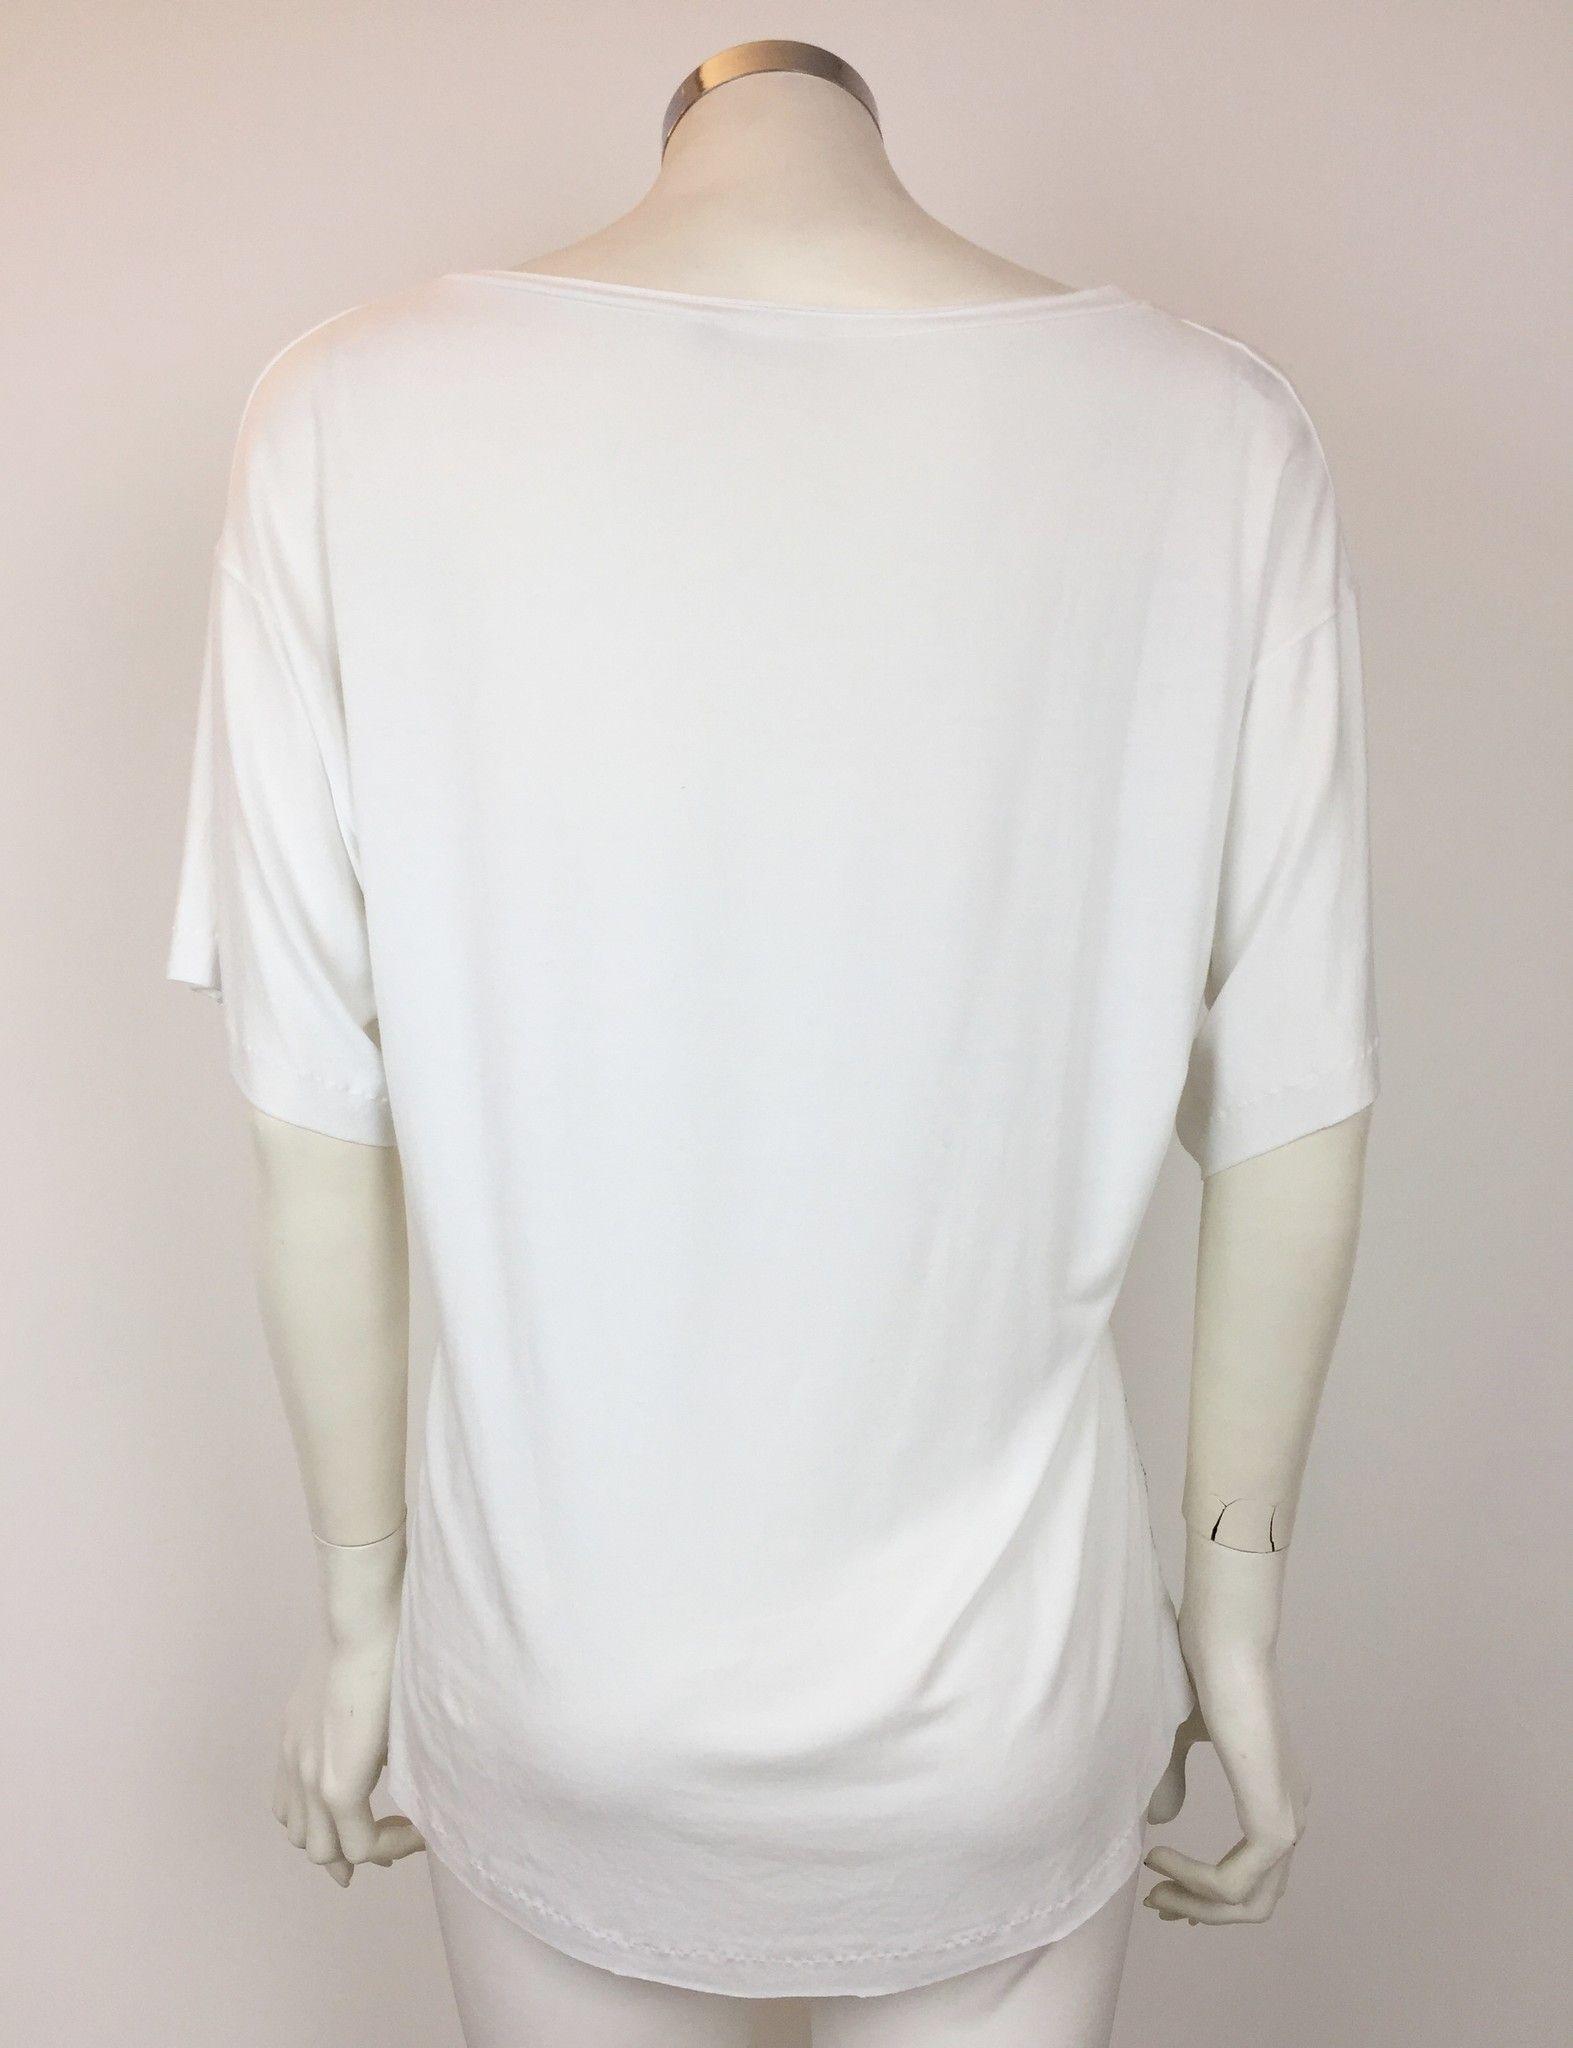 Q-Zee Over Skull Print T-Shirt Cod.412651